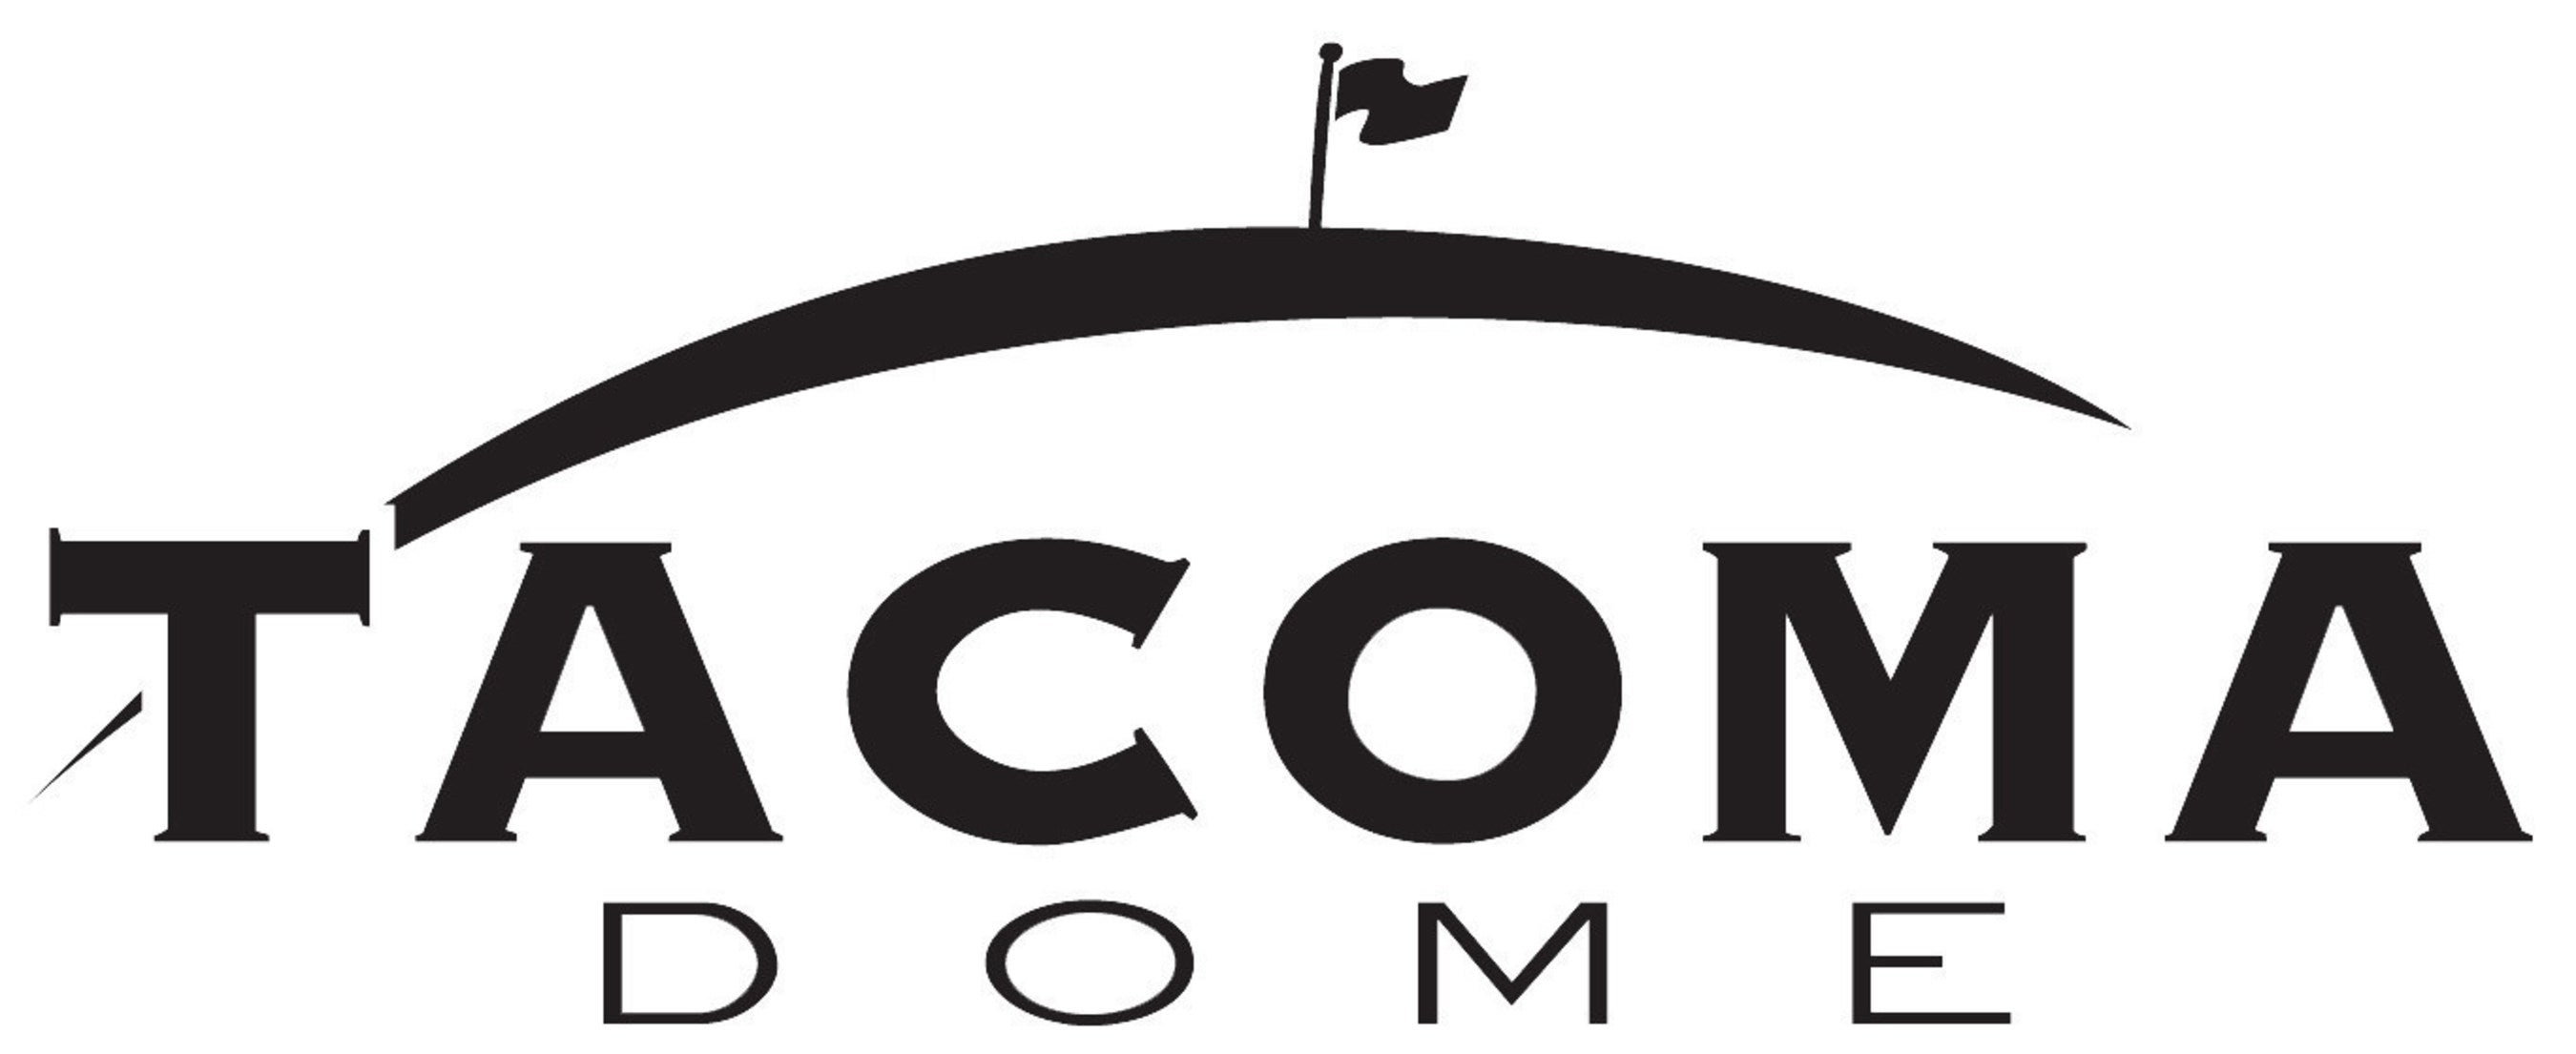 Tacoma Dome Exhibition Hall